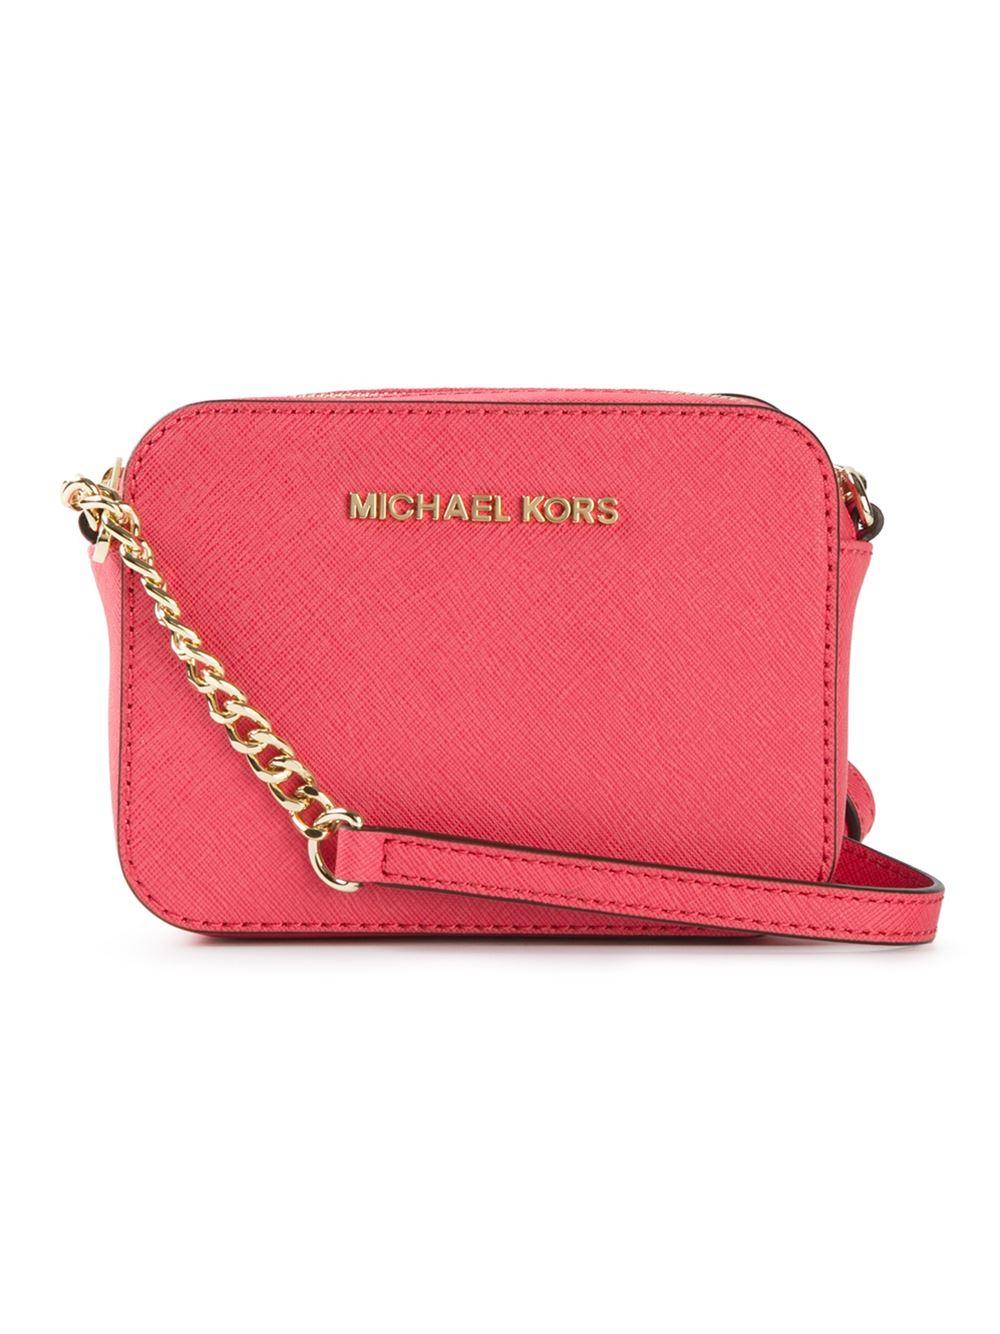 b627569967a2 Lyst - MICHAEL Michael Kors Jet Set Travel Cross-Body Bag in Red